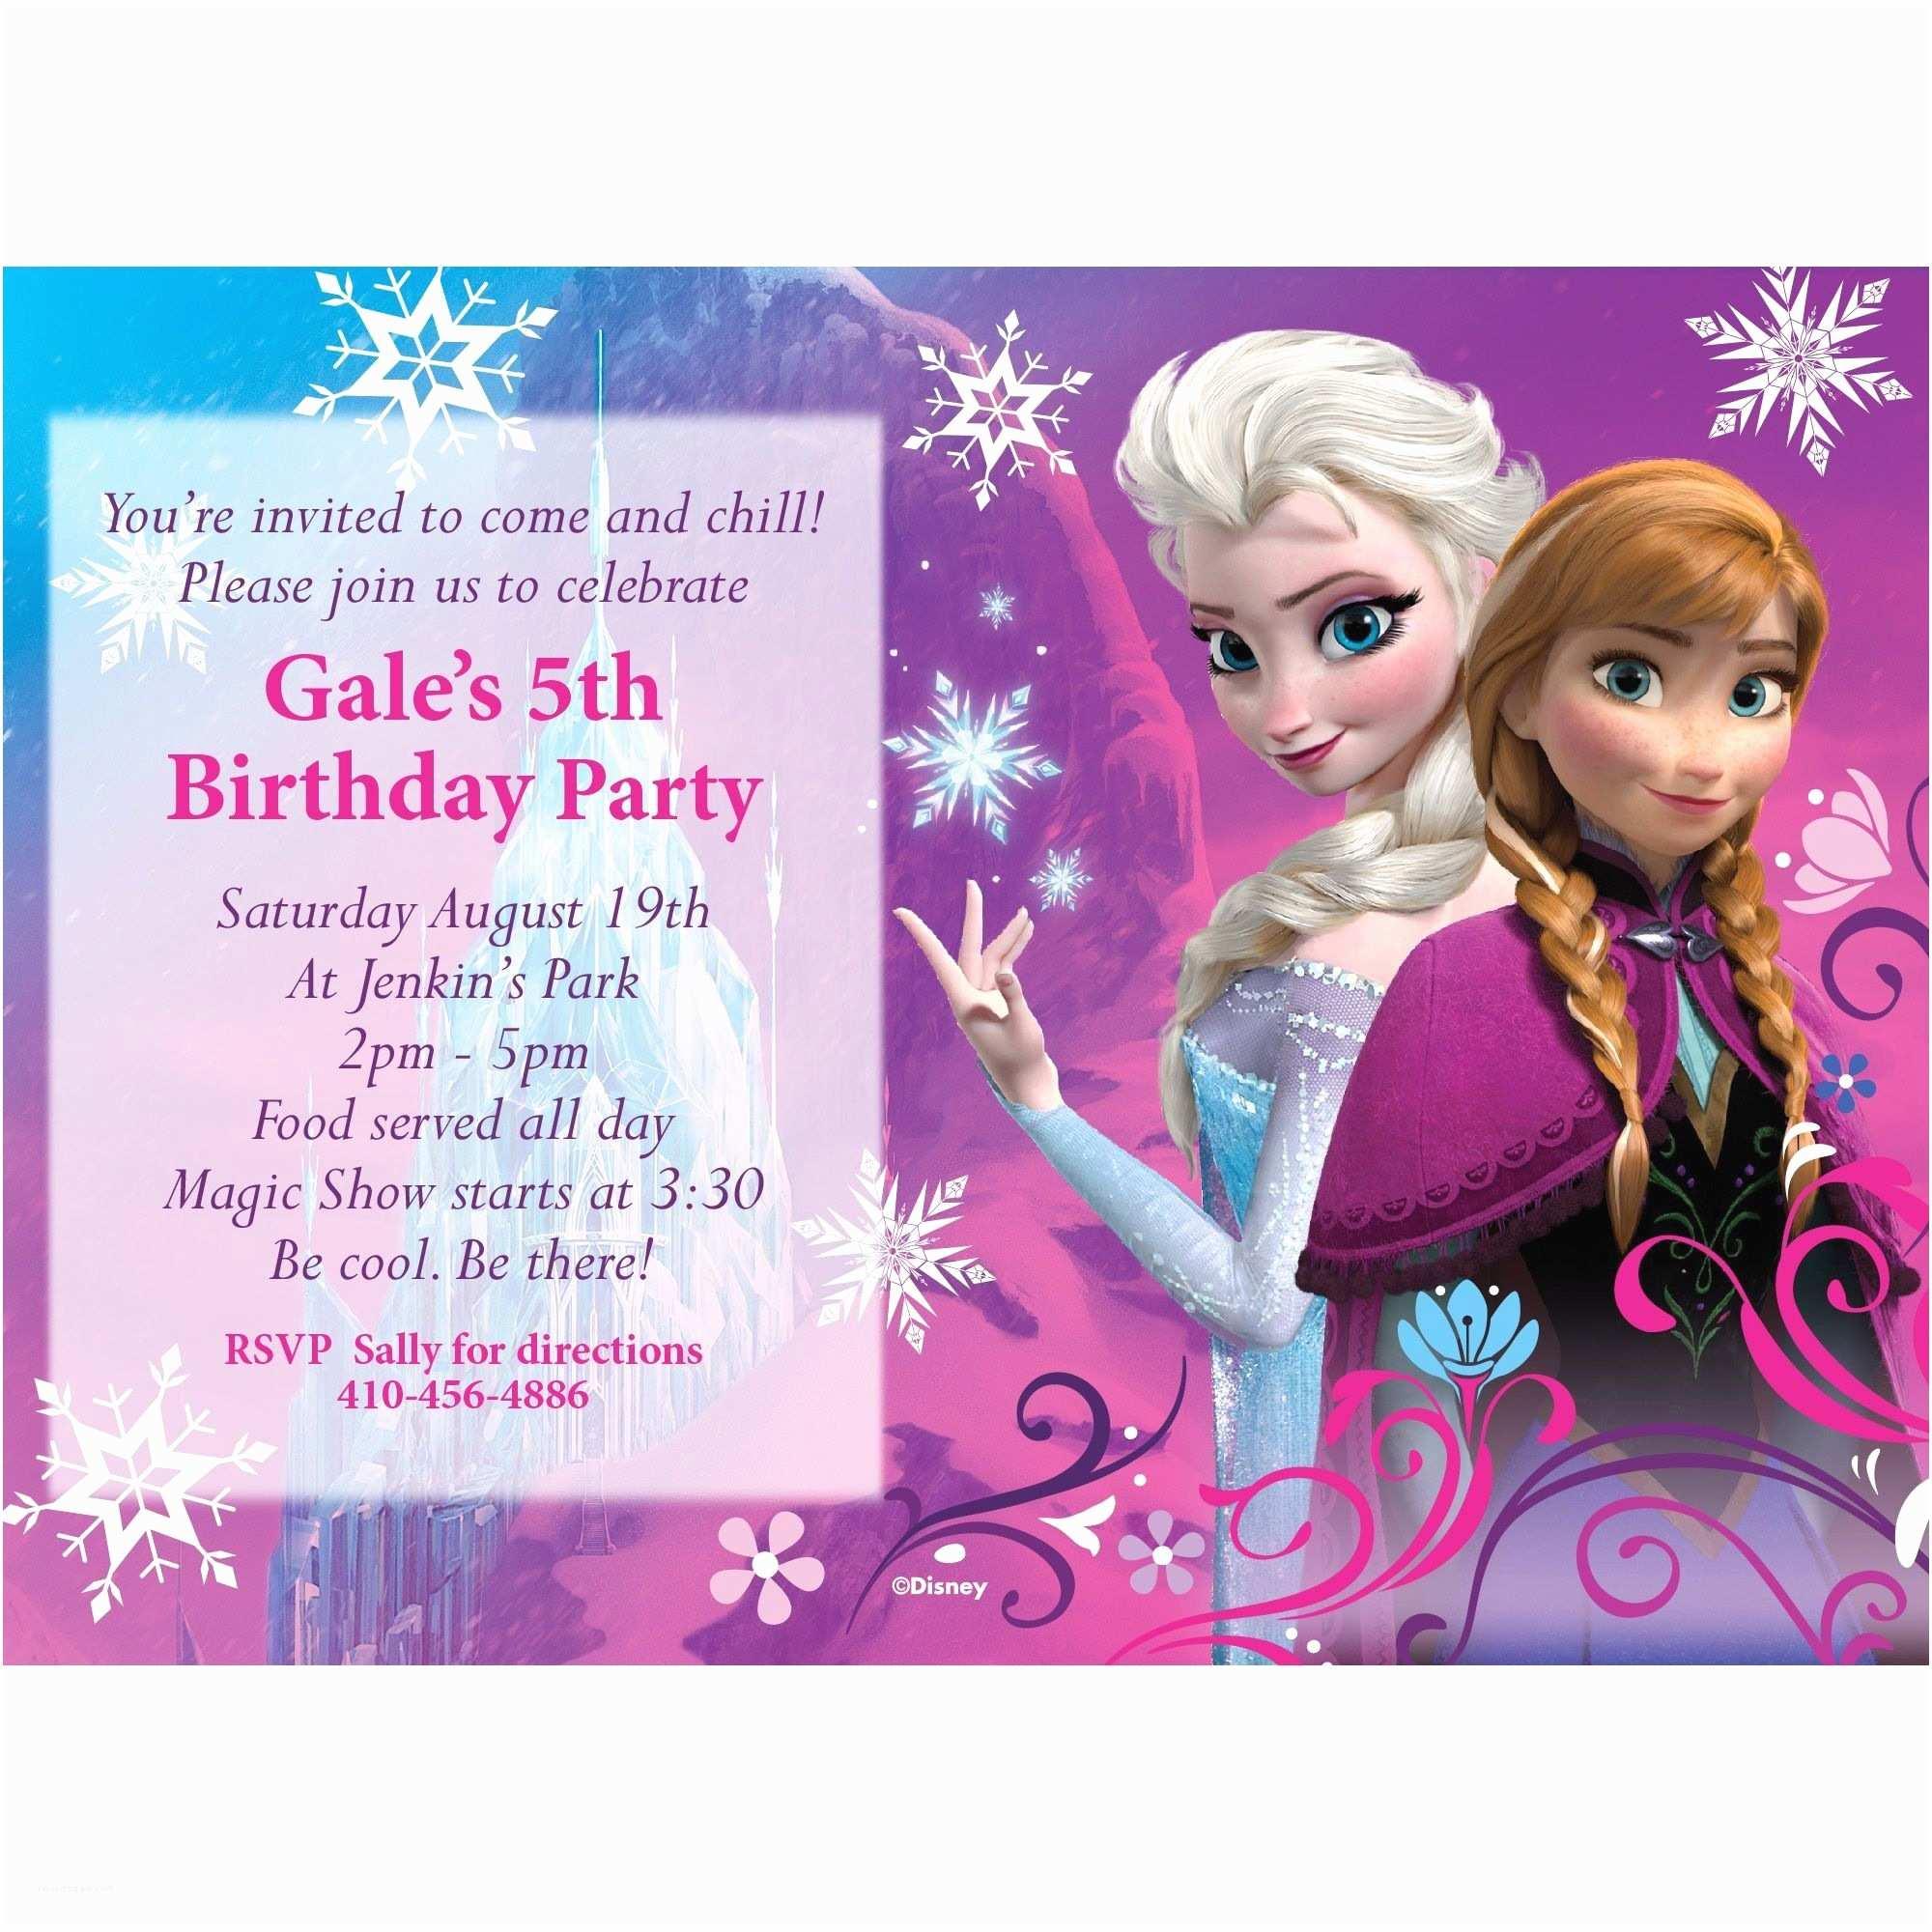 Personalized Frozen Birthday Invitations Personalized Frozen Birthday Invitations – Gangcraft